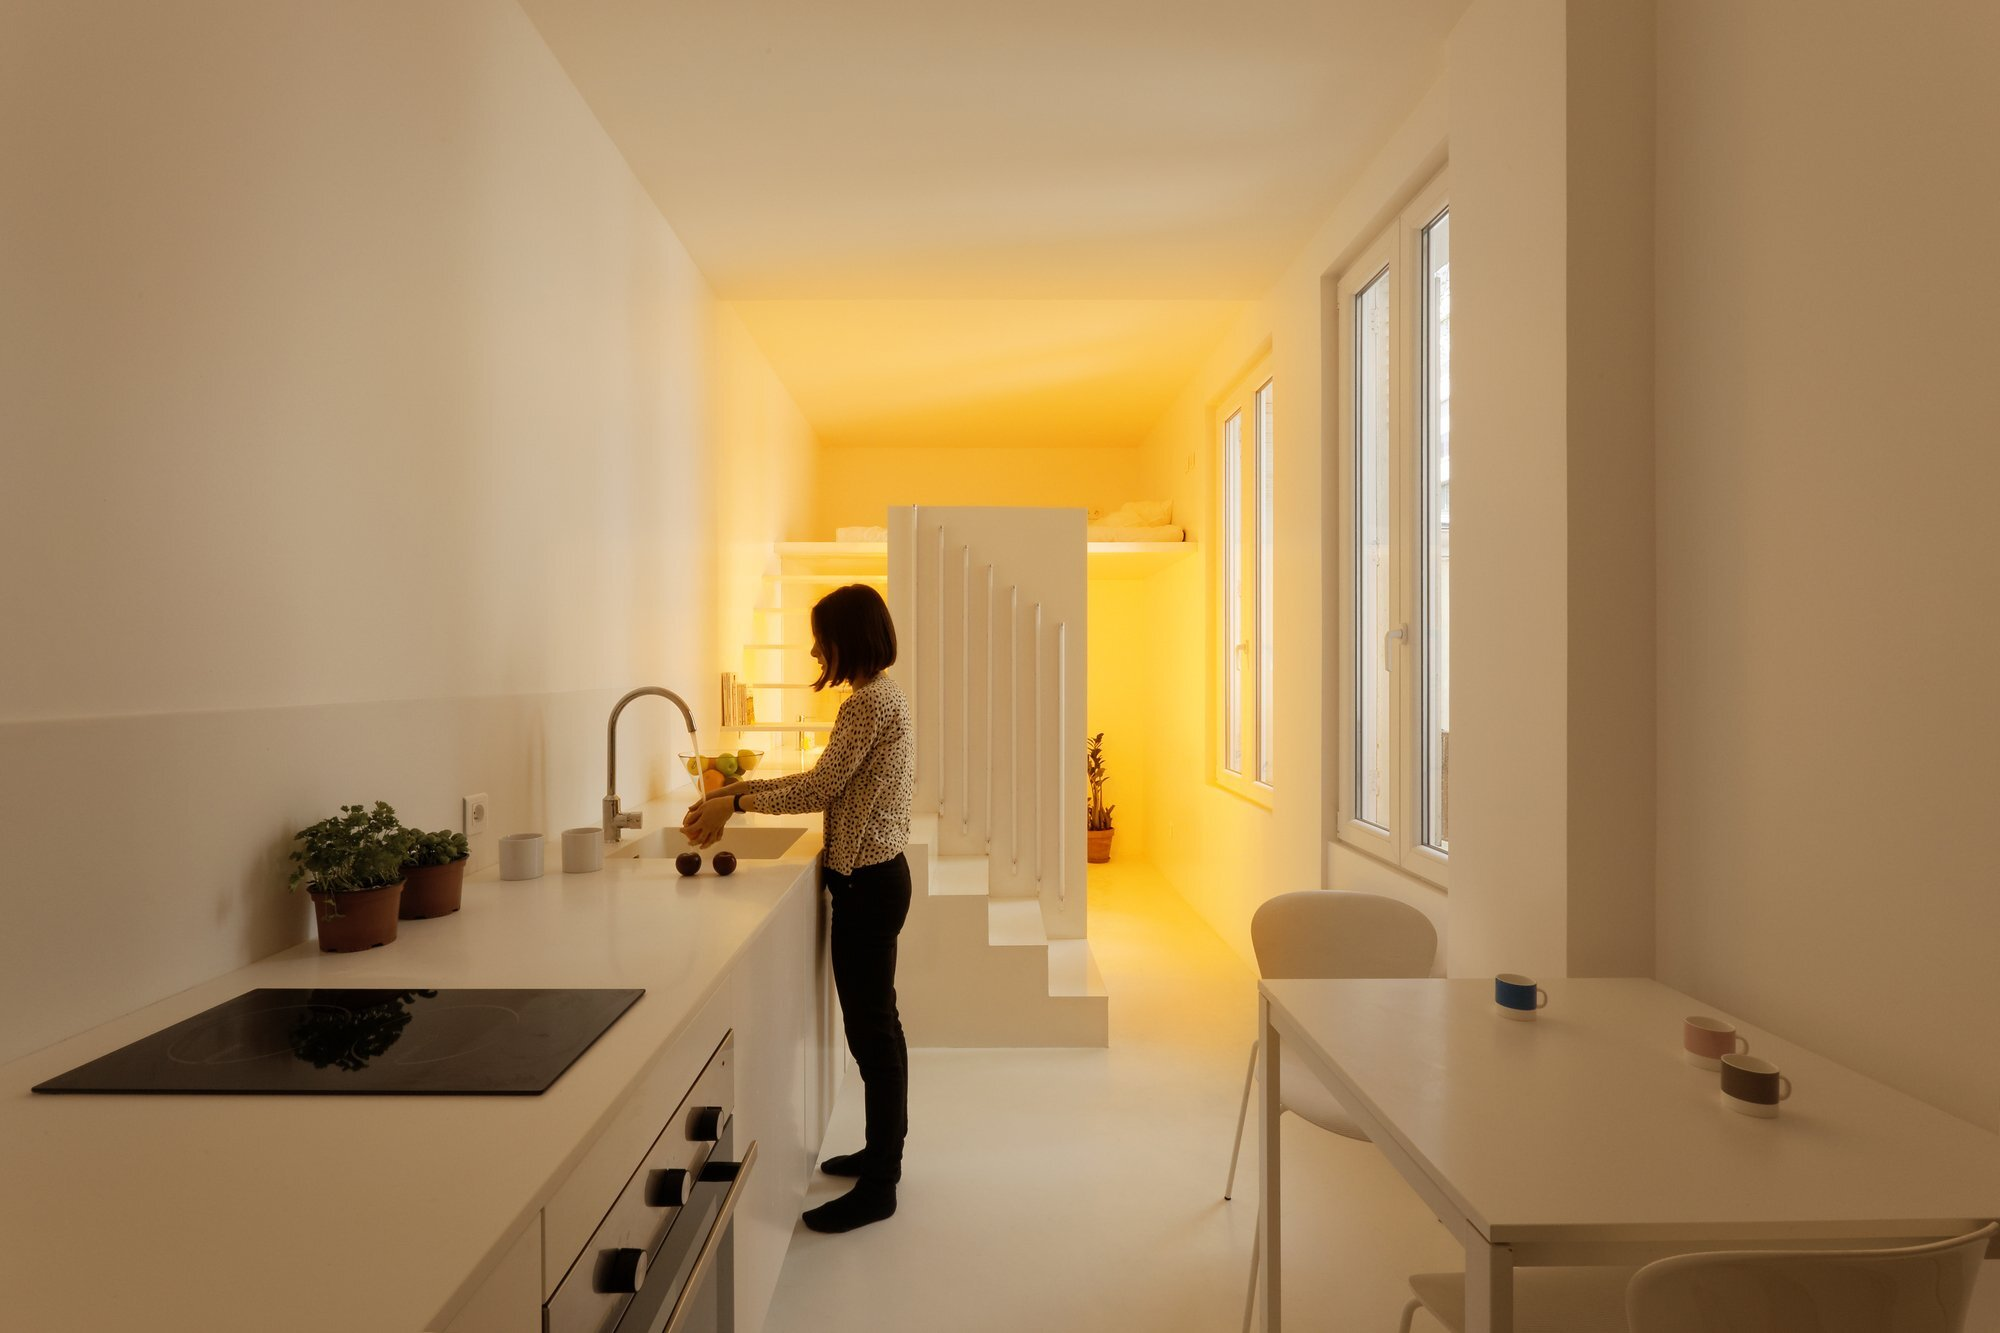 Appartement Spectral - BETILLON DORVAL‐BORY - Paris - France - Tiny Apartment - Kitchen - Humble Homes